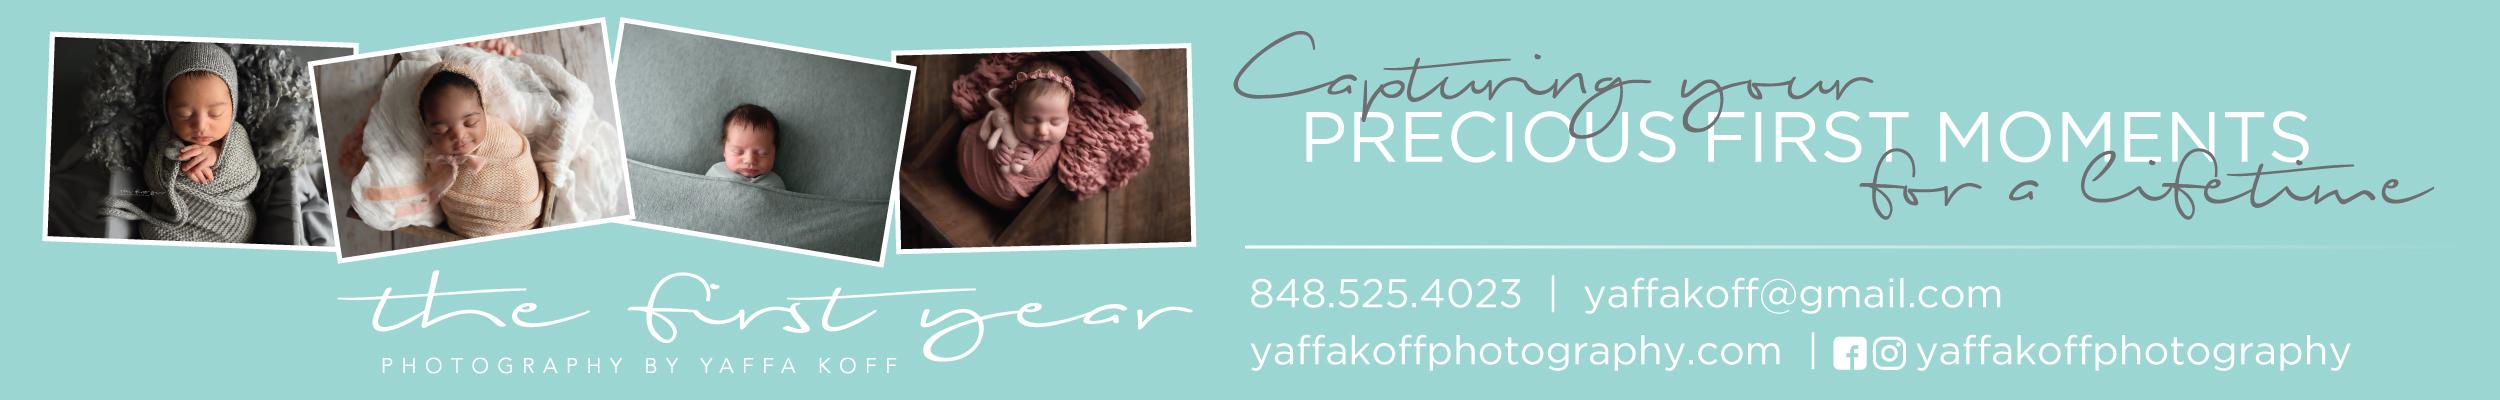 koff photography ad.jpg